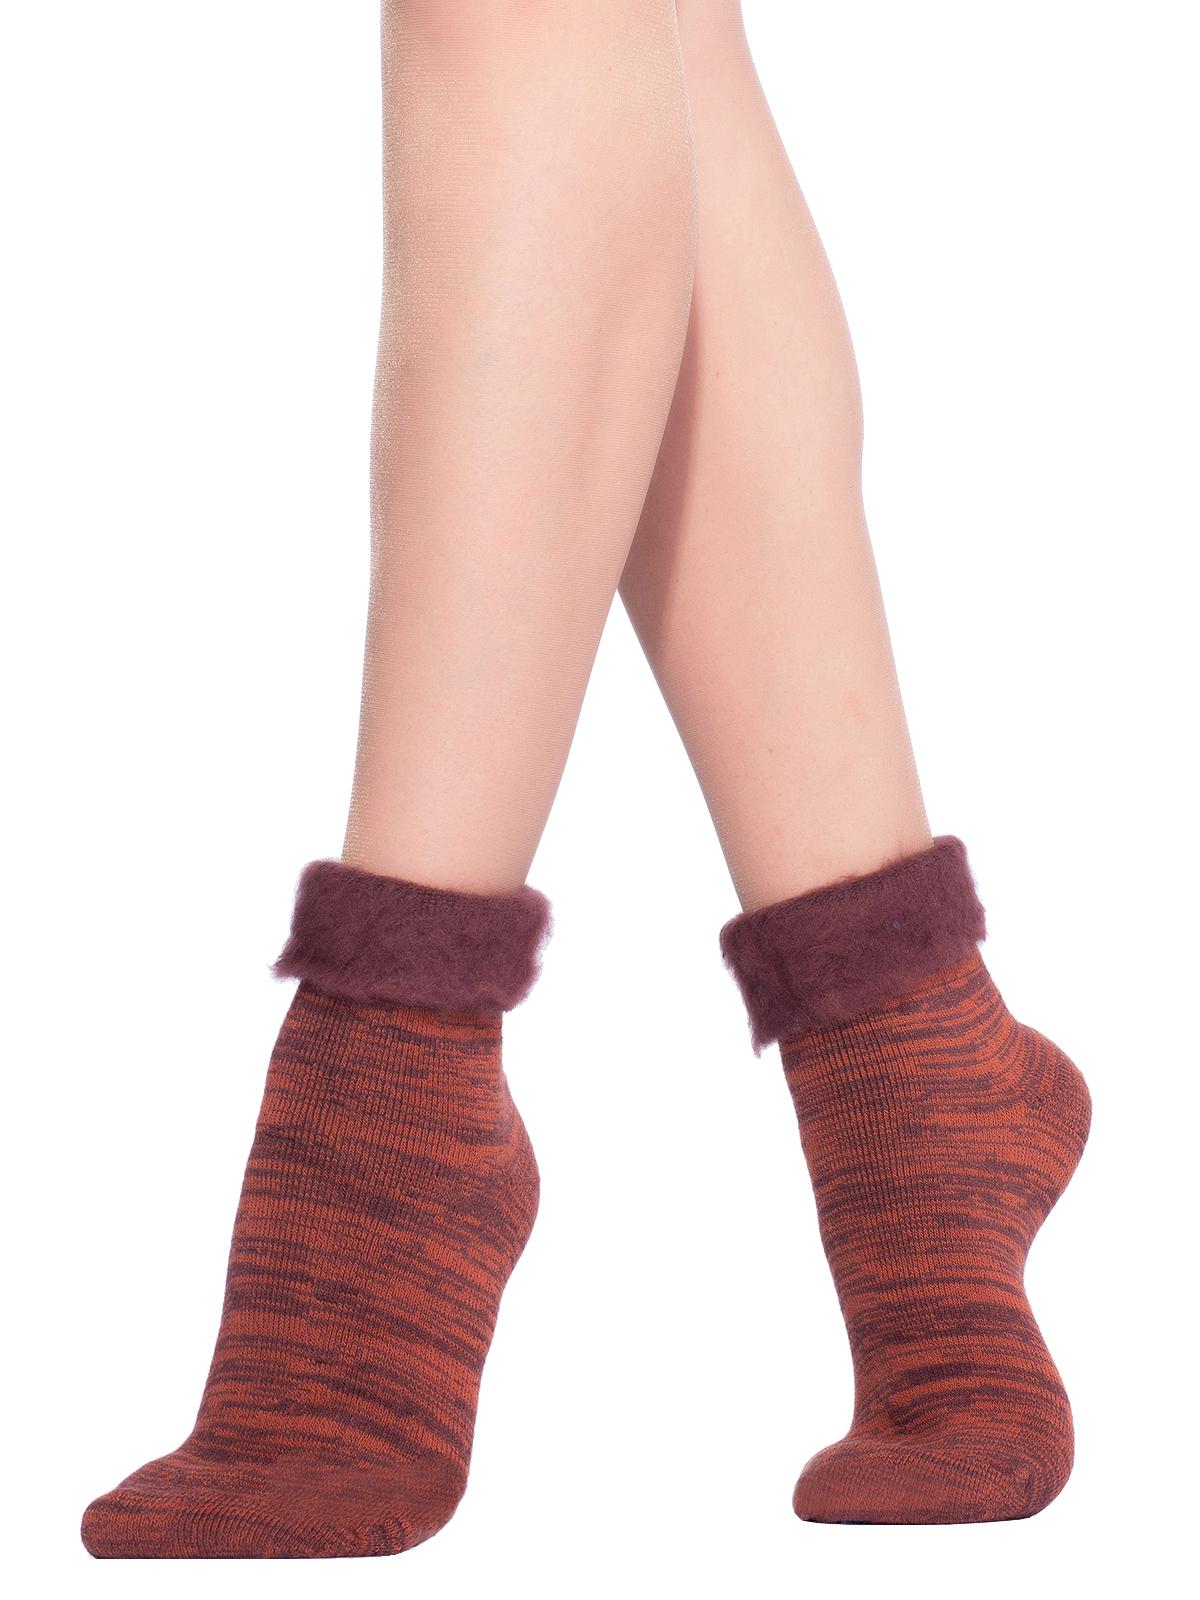 Носки женские Hobby Line коричневые 36-40